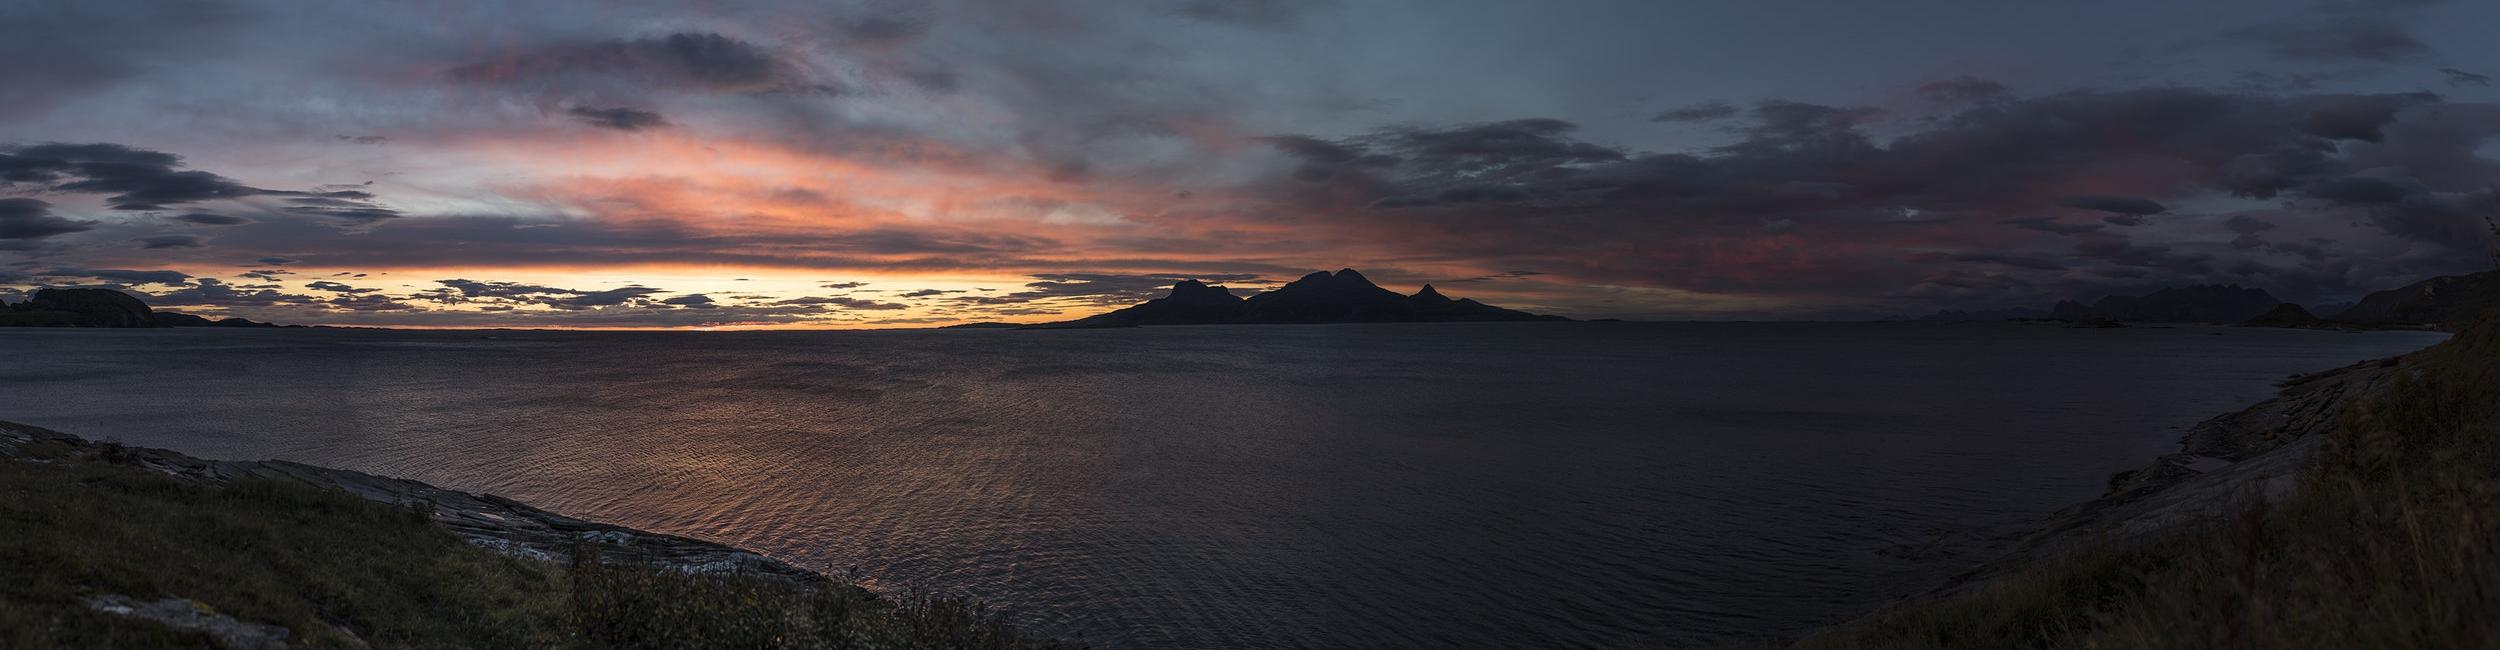 Bodø Panorama Norway.jpg